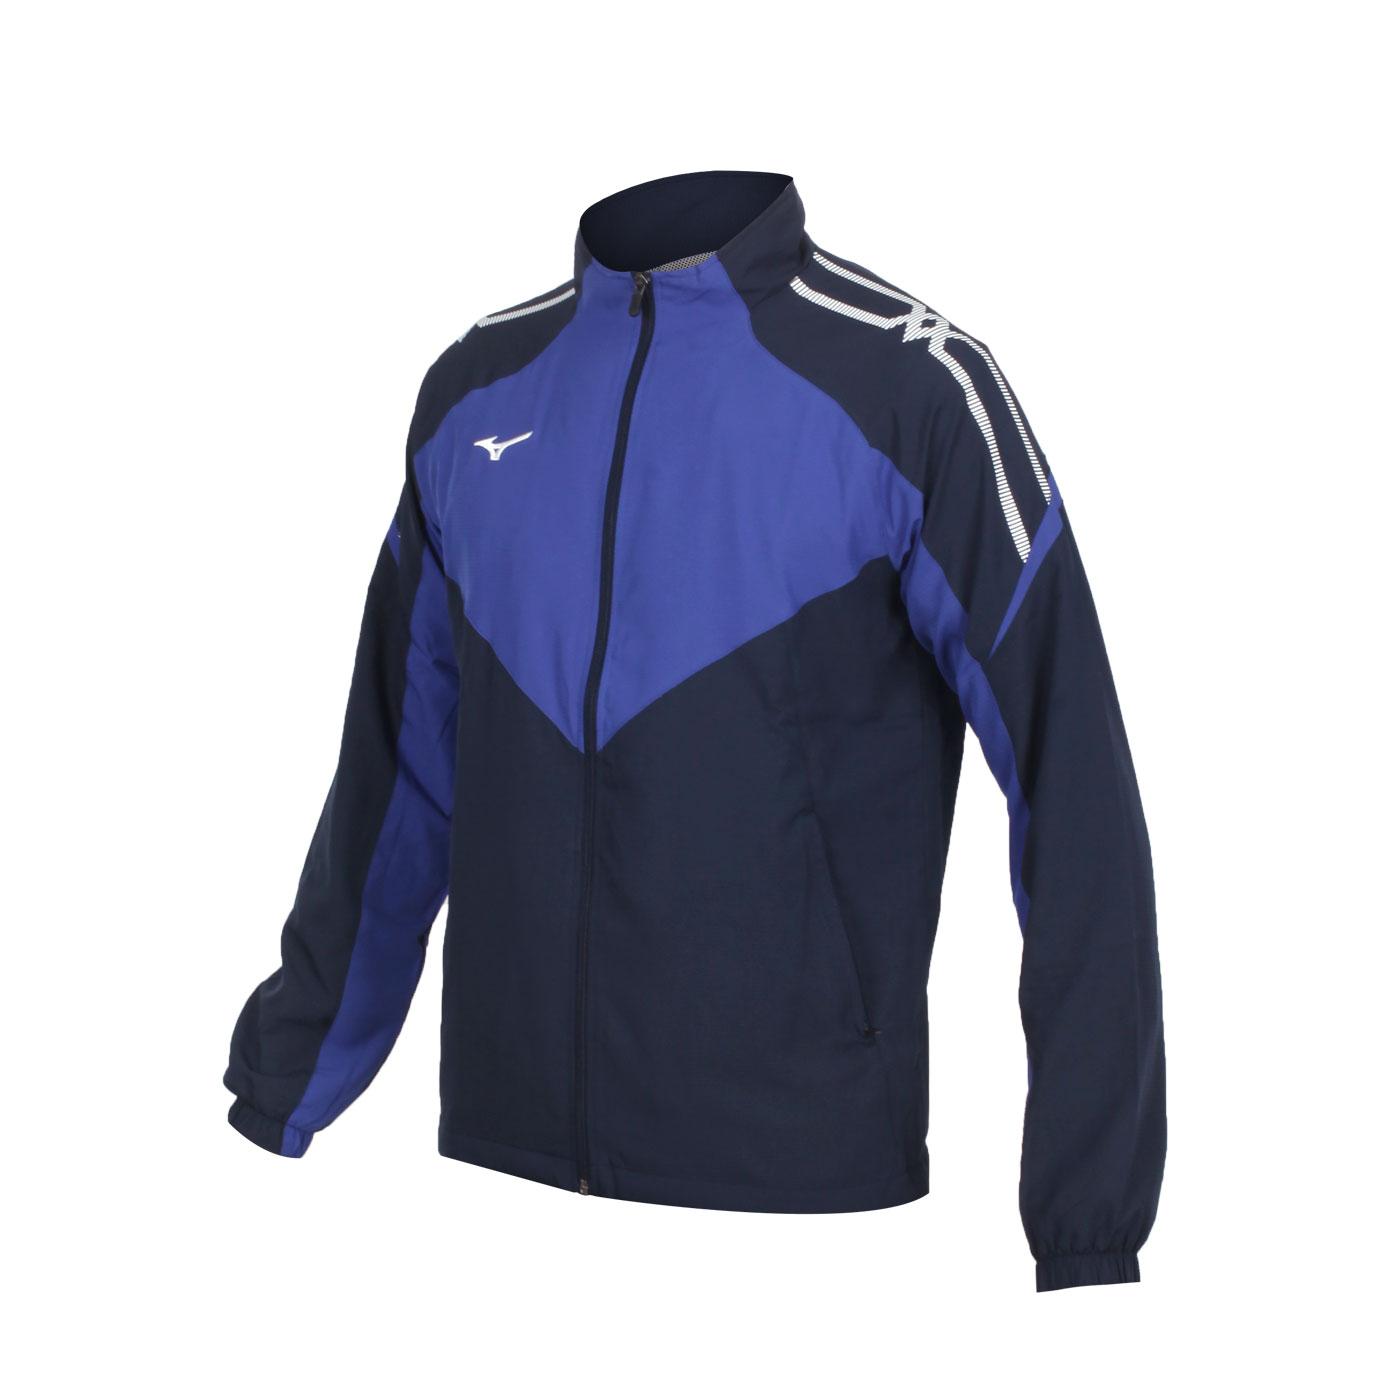 MIZUNO 男款平織運動外套 32TC058314 - 藍丈青白